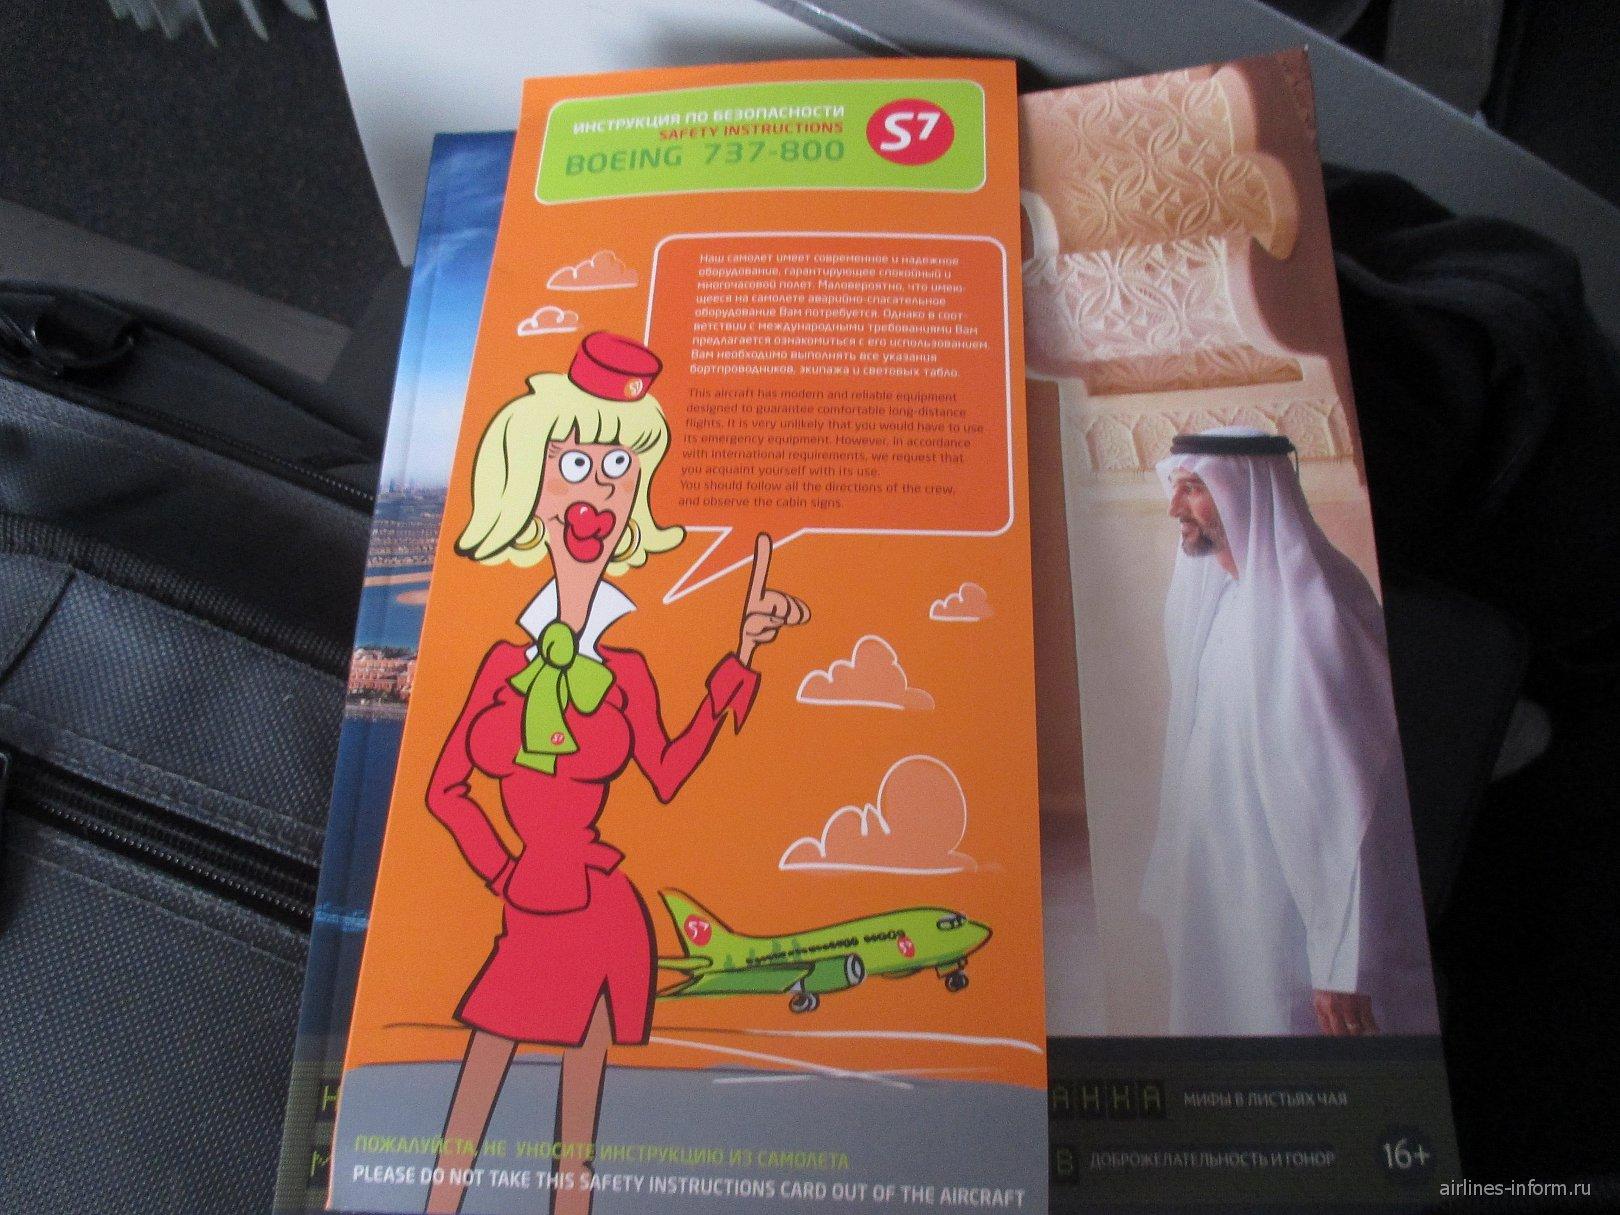 Инструкция по безопасности Боинг-737-800 S7 Airlines